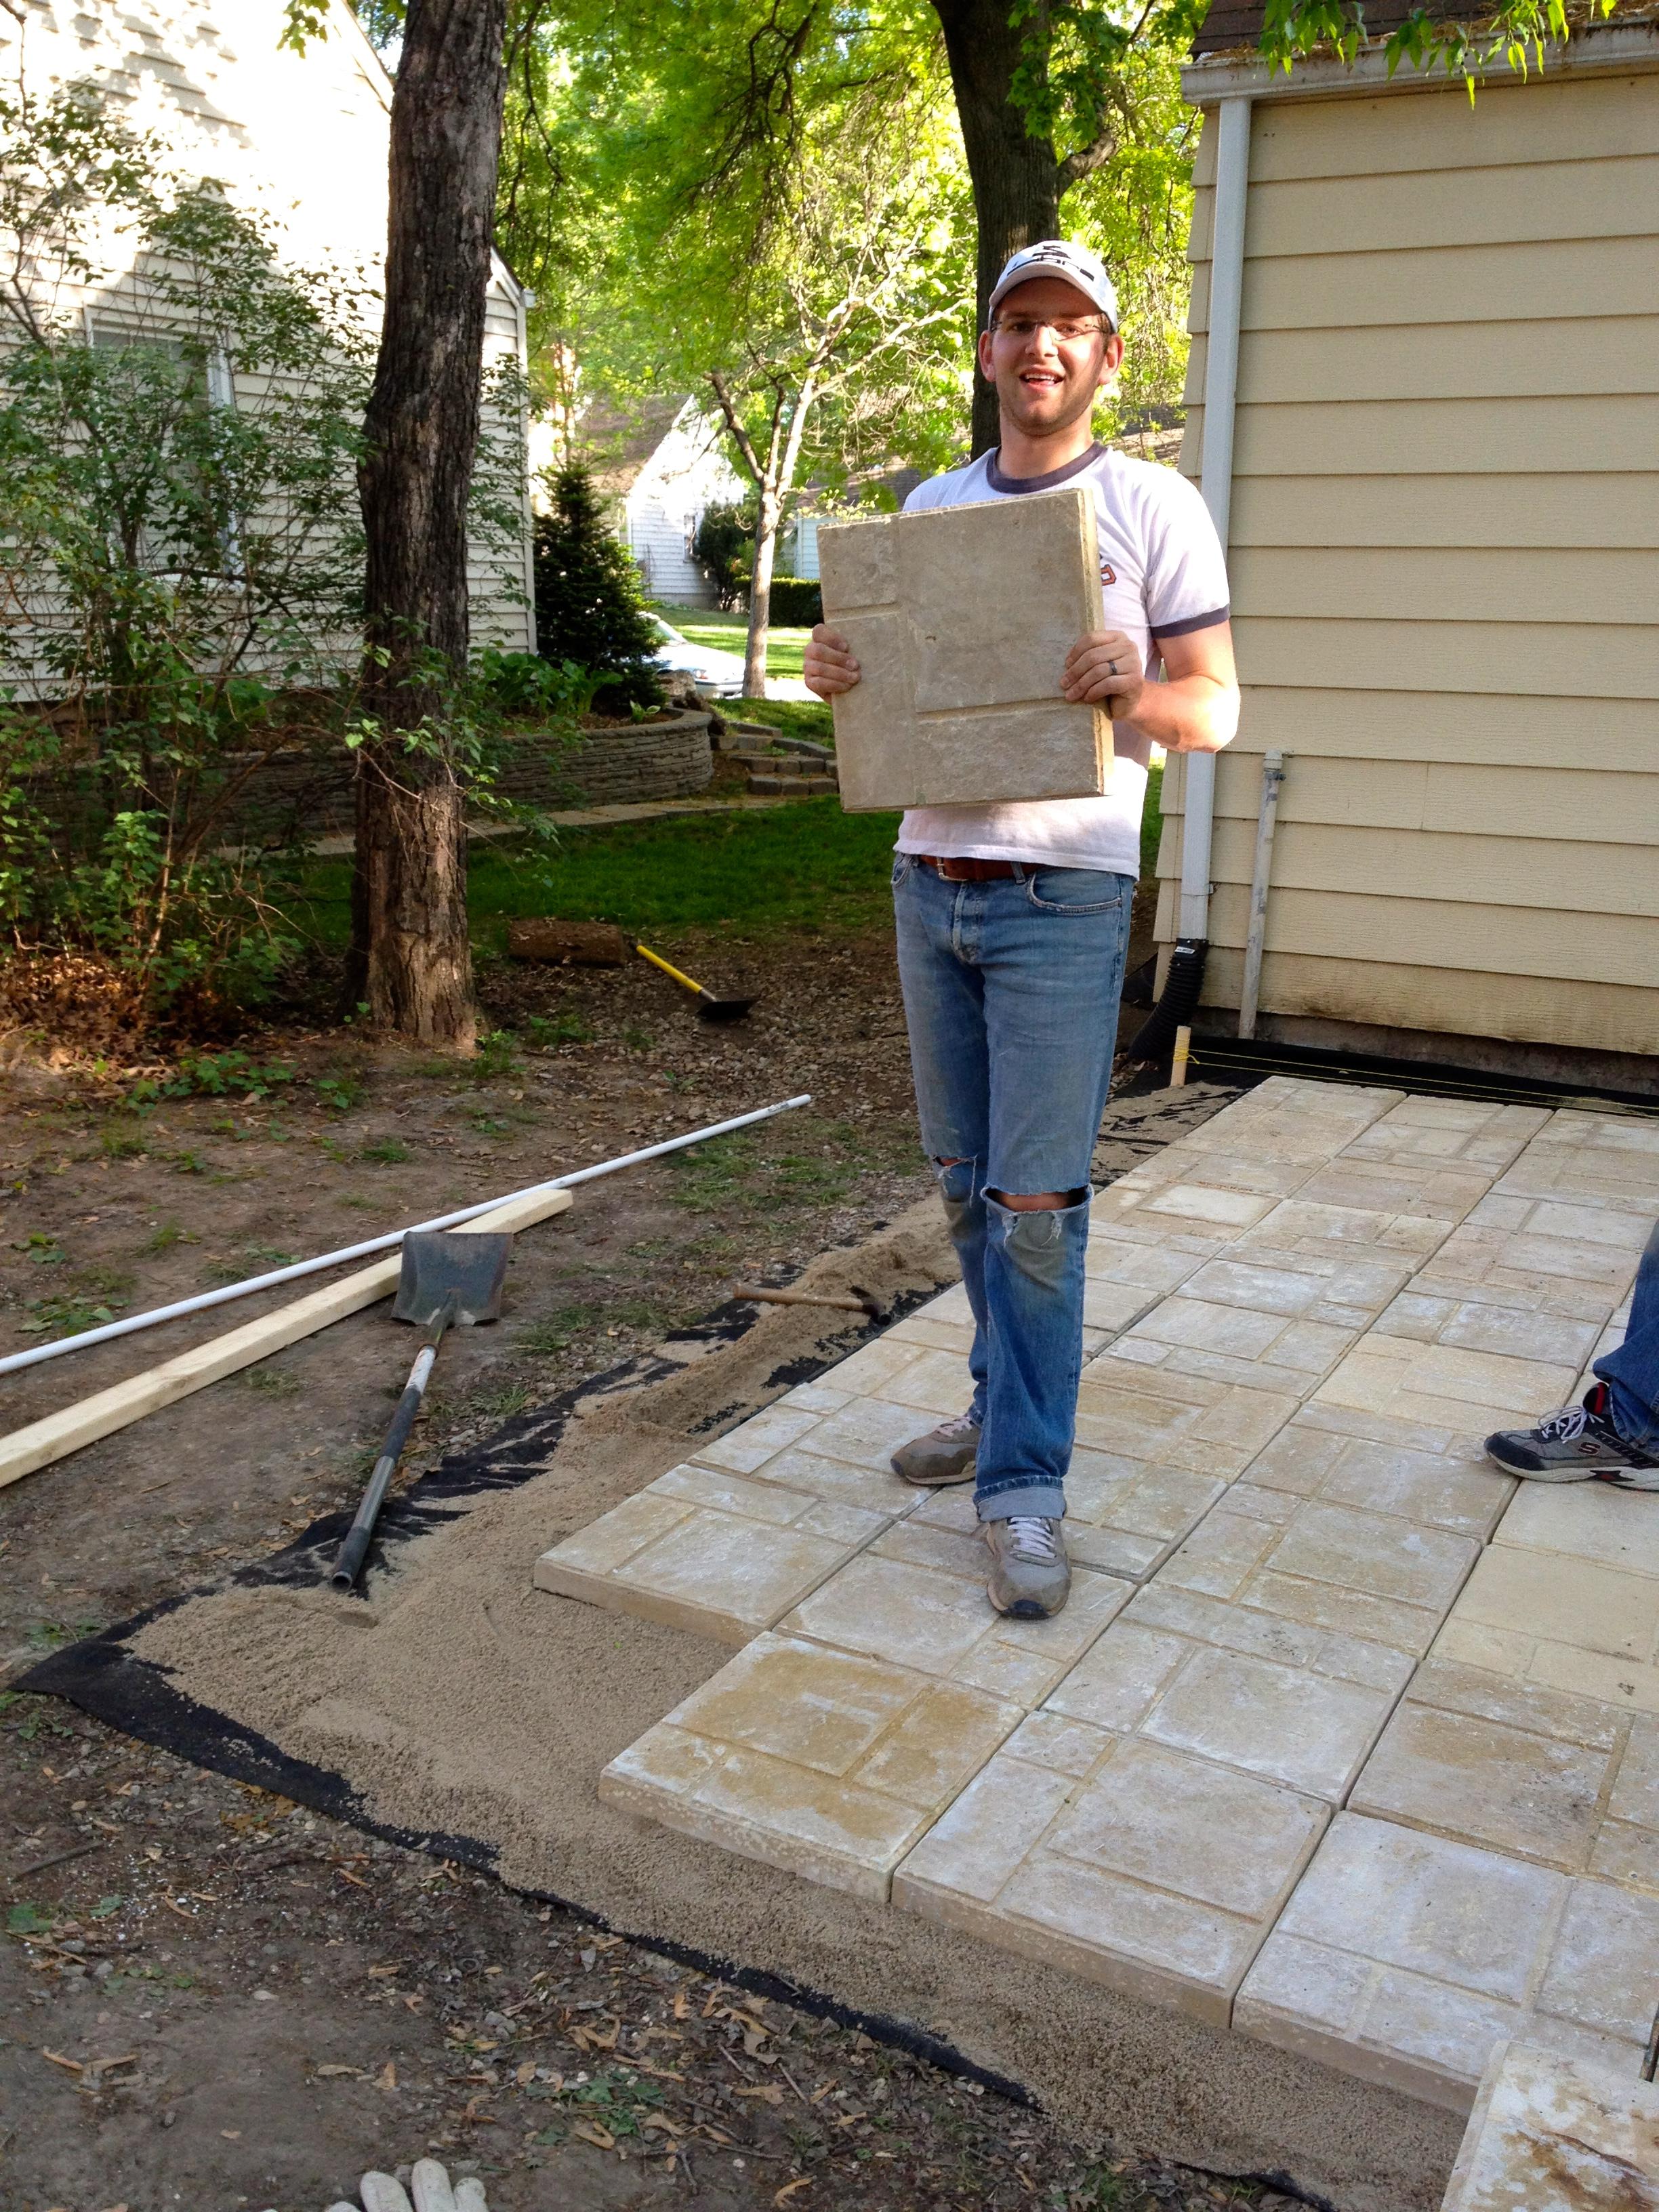 installing a paver patio diy diy paver patio the suburban urbanist